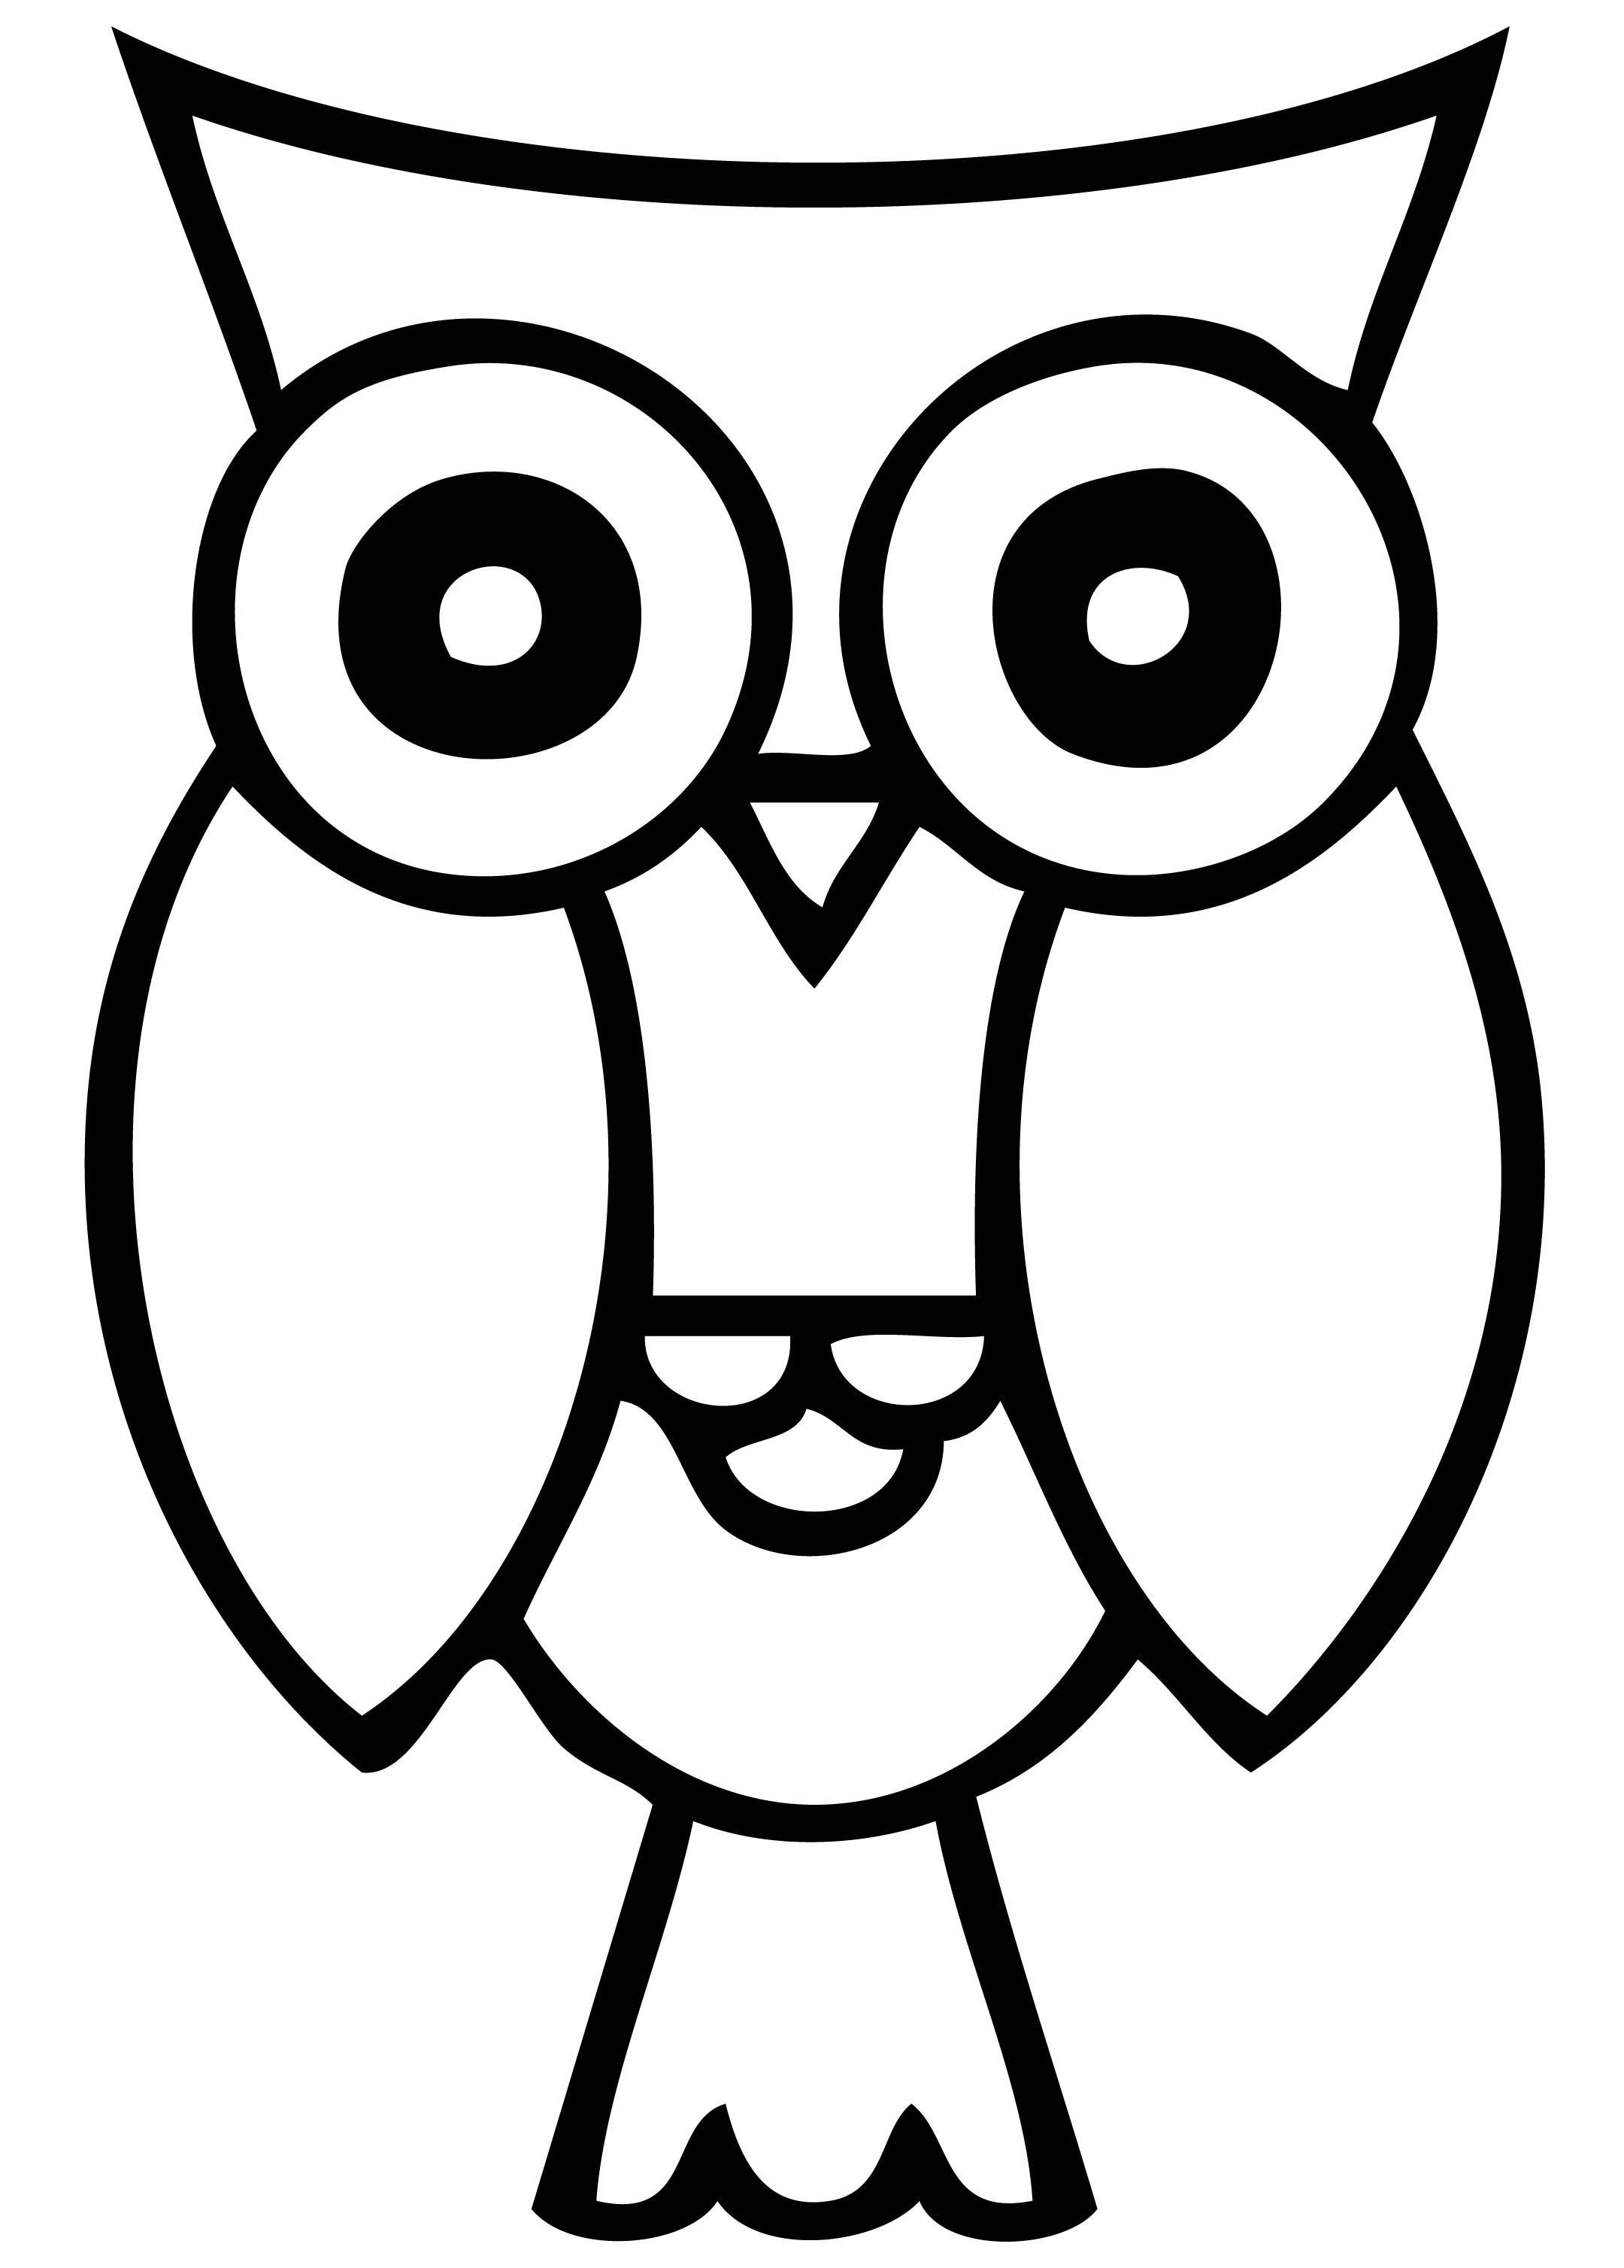 wise owl clipart clipart panda free clipart images Owl with Glasses Clip Art Owl with Glasses Clip Art